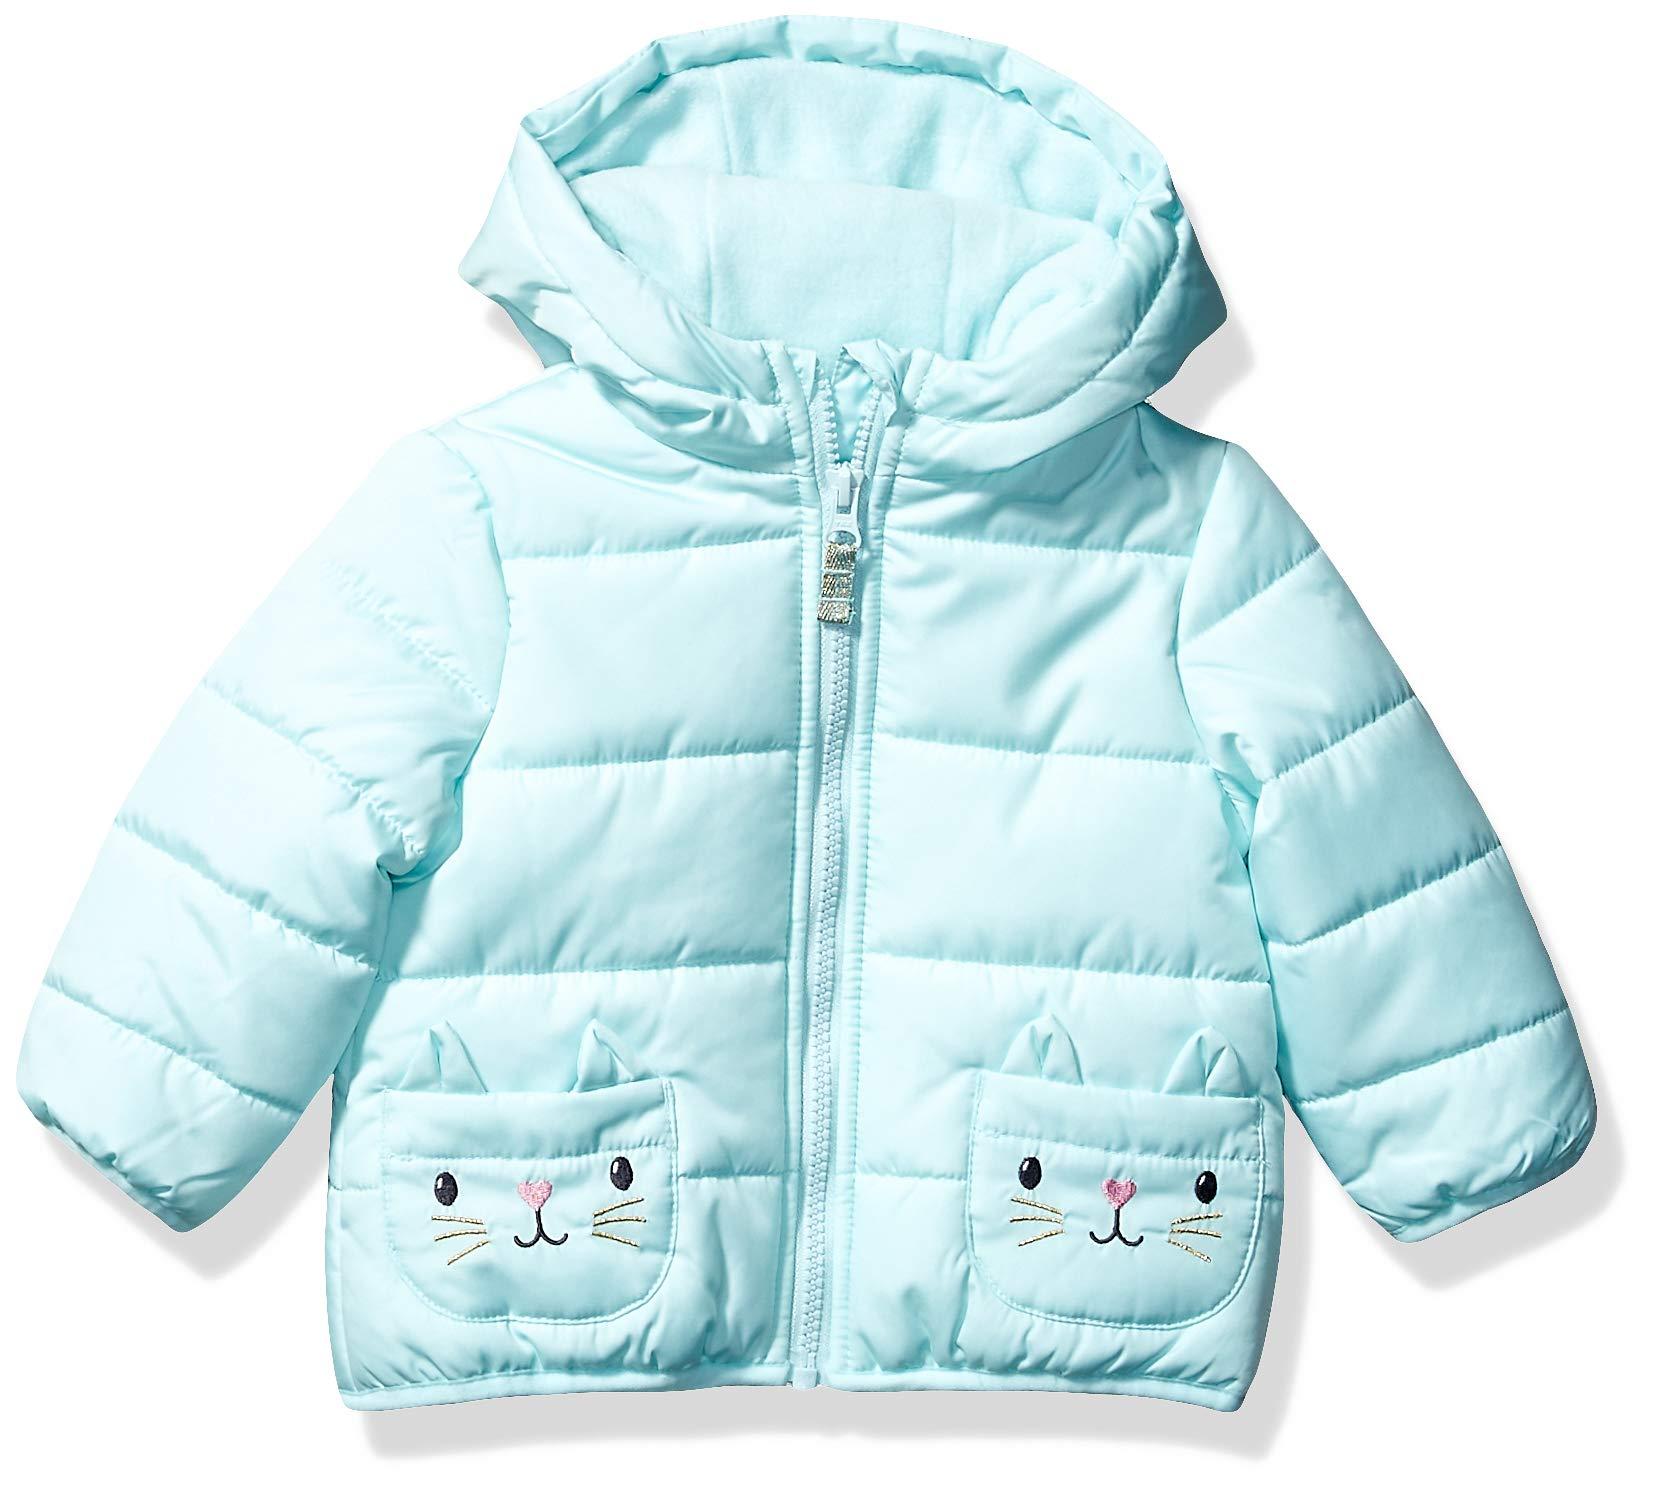 Carter's Baby Girls Fleece Lined Critter Puffer Jacket Coat, Seaside Kitten, 18 Months by Carter's